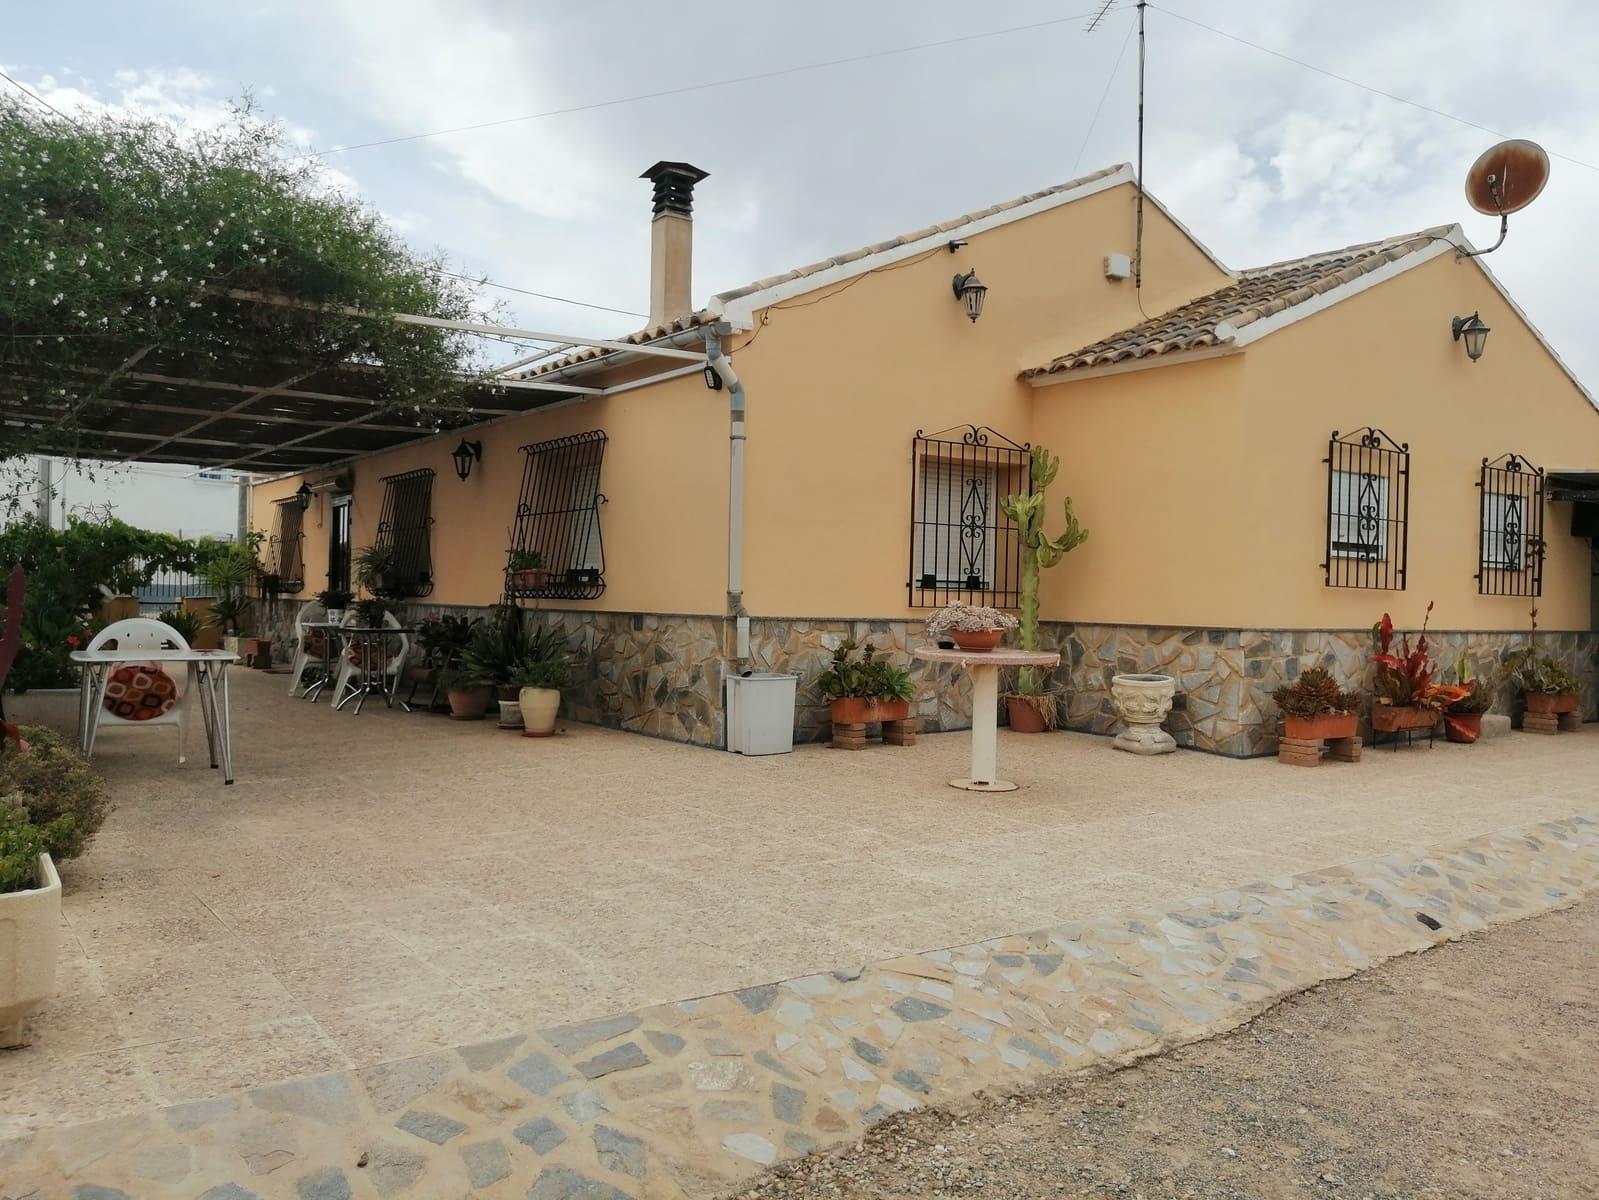 4 quarto Quinta/Casa Rural para venda em Corvera - 165 000 € (Ref: 5480669)